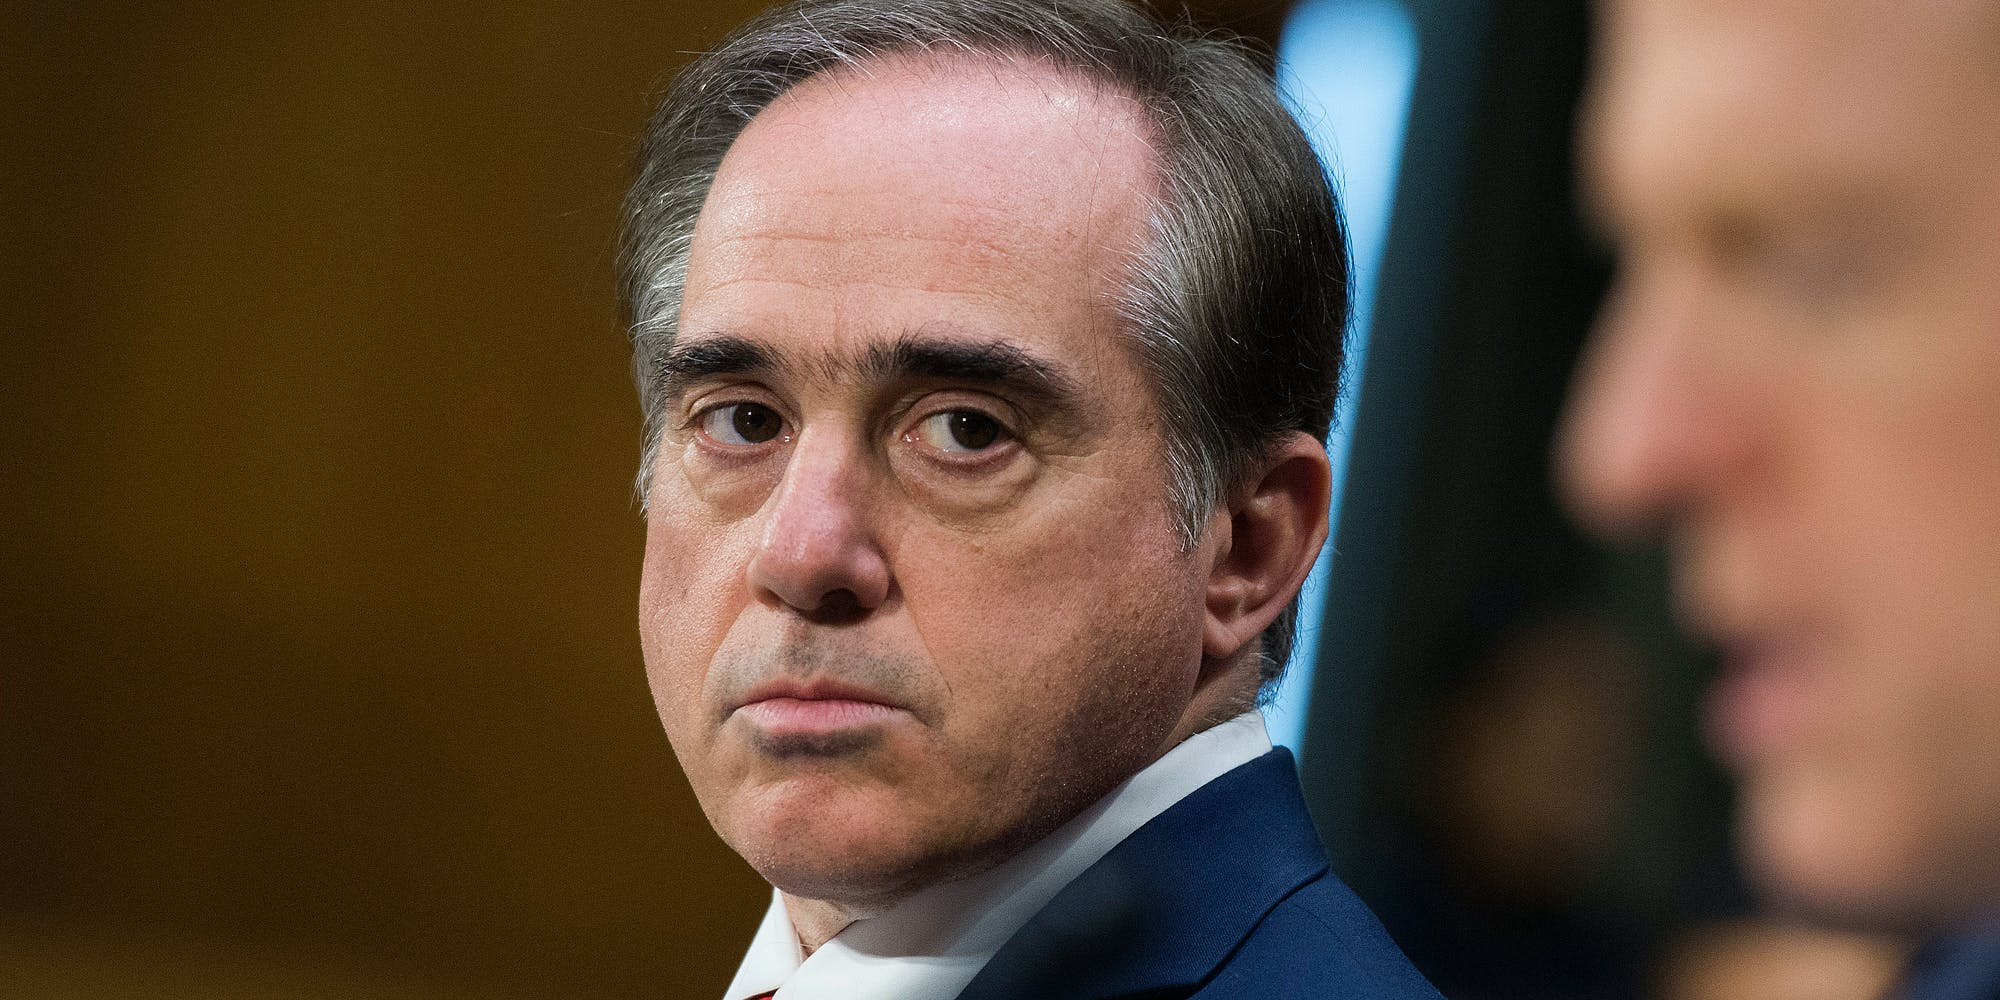 Will The VA's Attitudes Toward Marijuana Change If Secretary Shulkin Gets Fired?